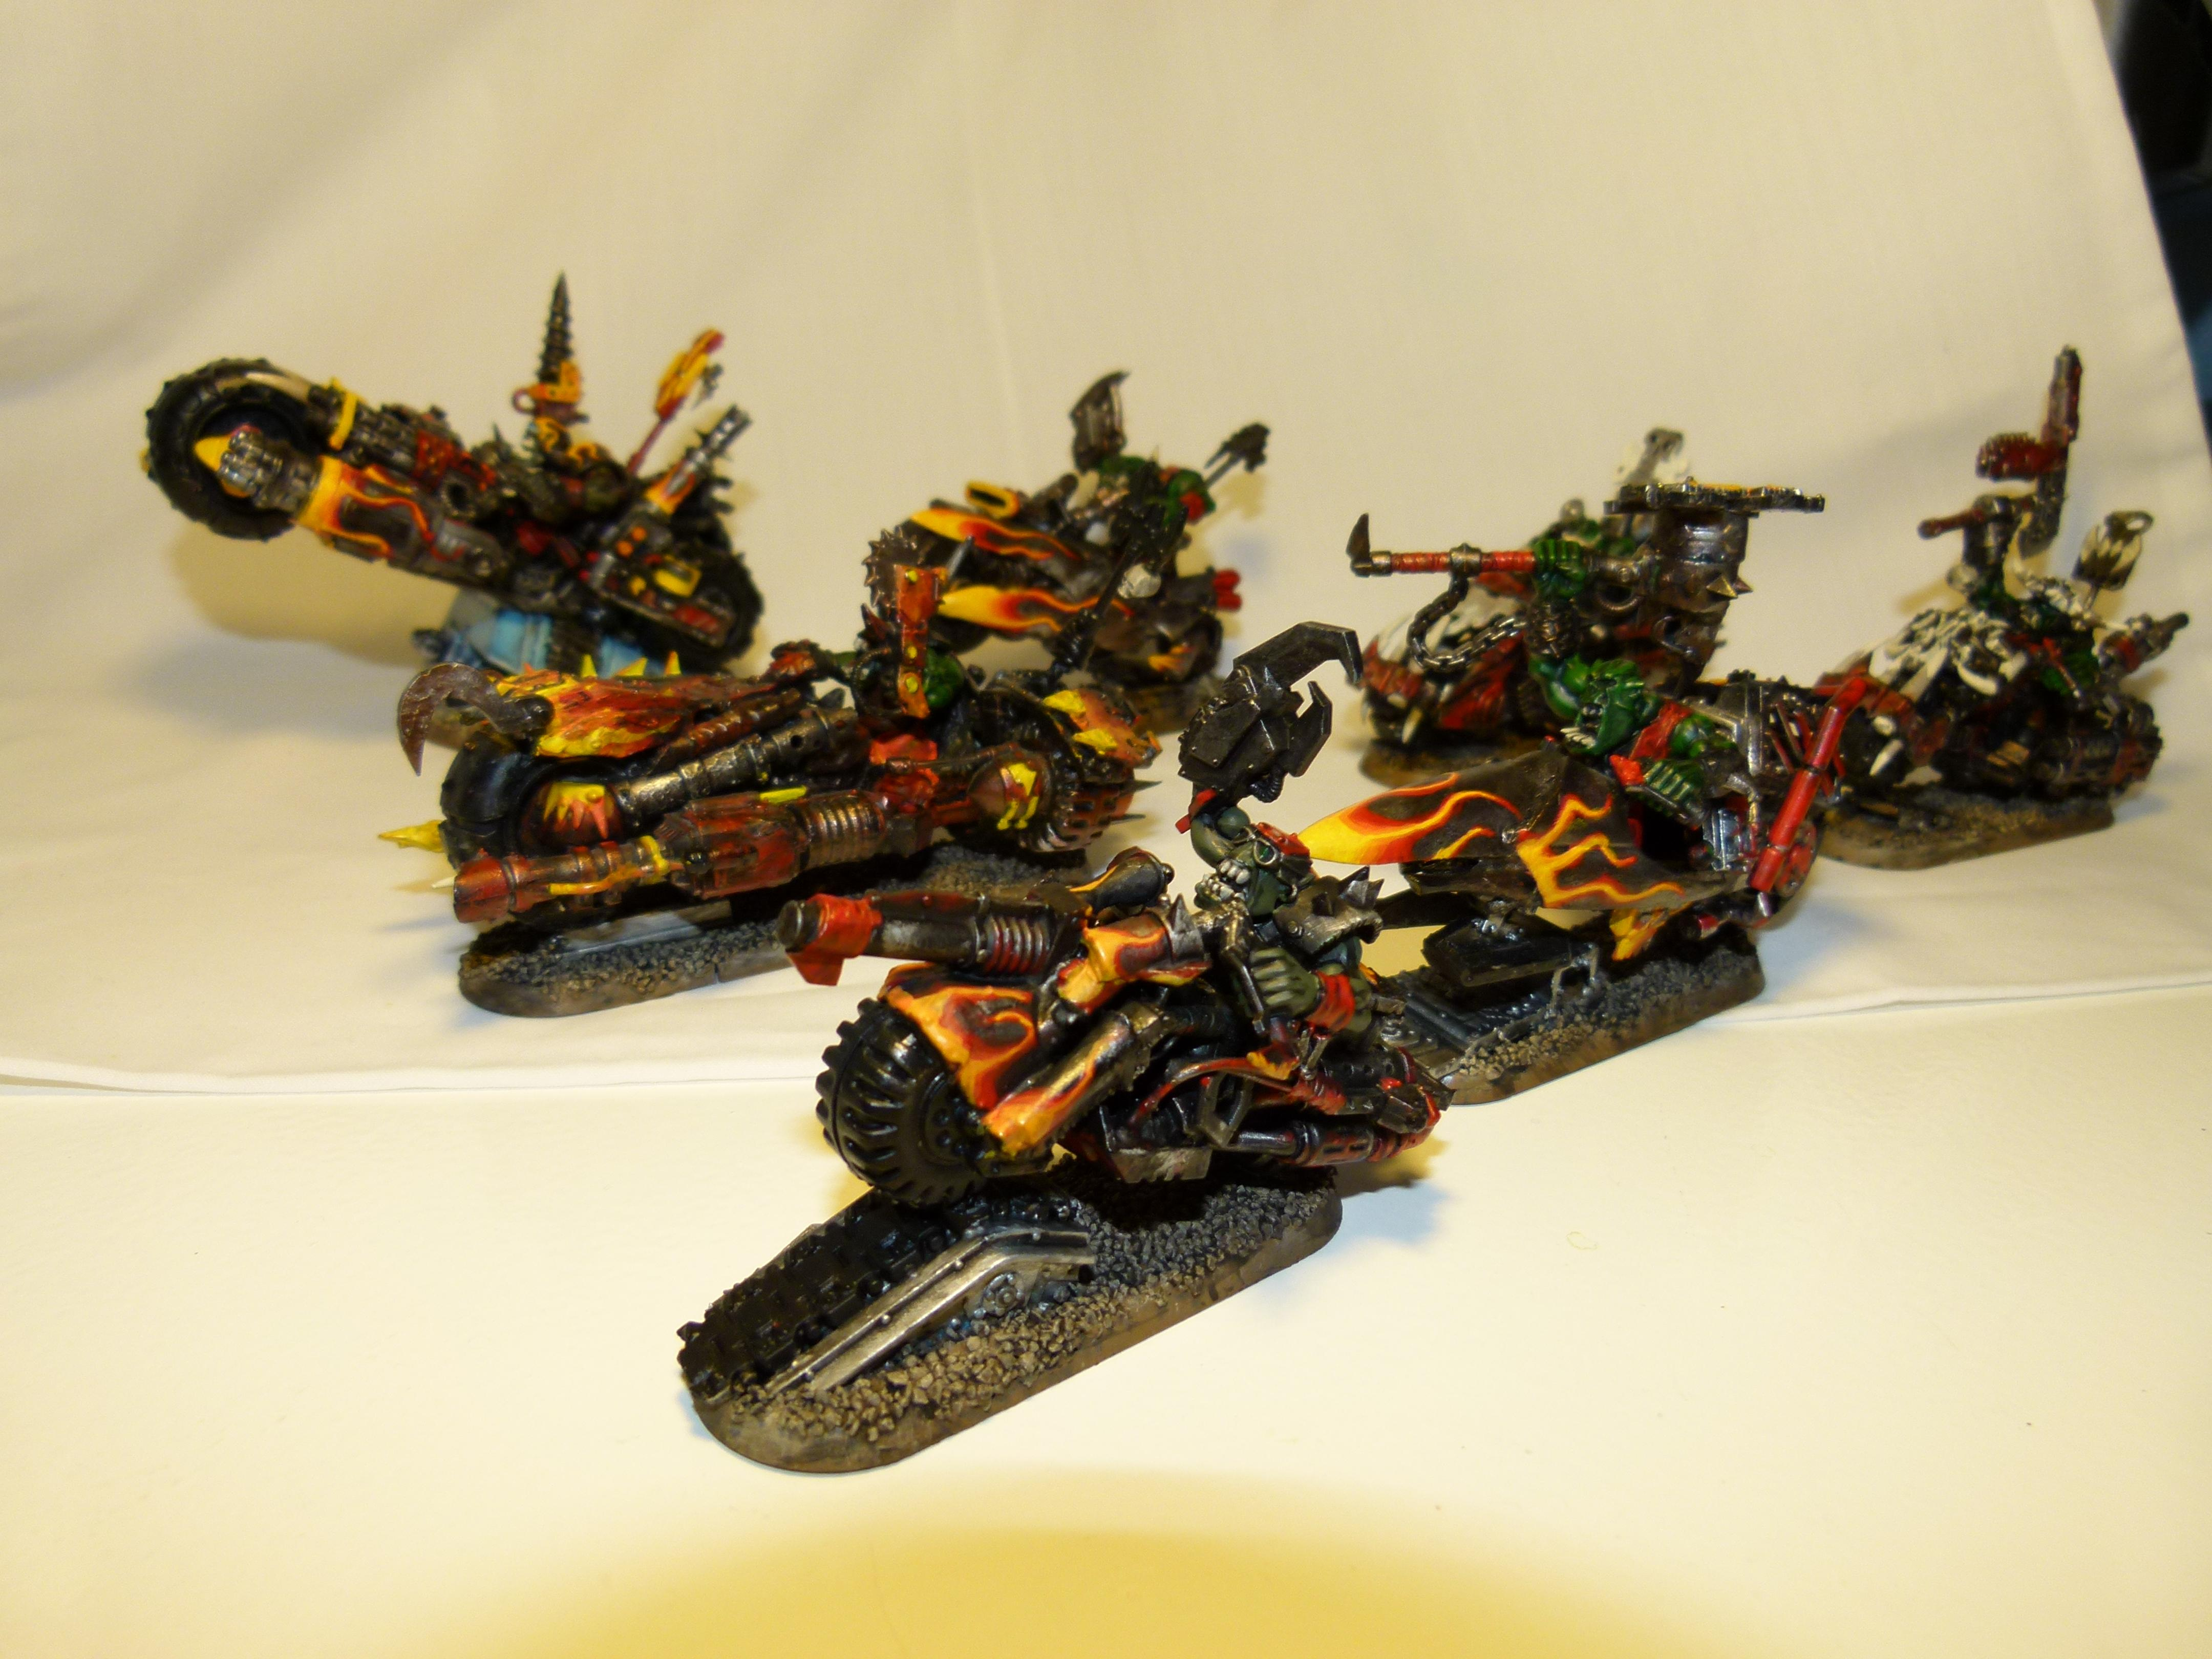 Bike, Biker Boss, Conversion, Elites, Mob, Nob, Orks, Painboys, Warboss, Warhammer 40,000, Wazdakka Gutsmek